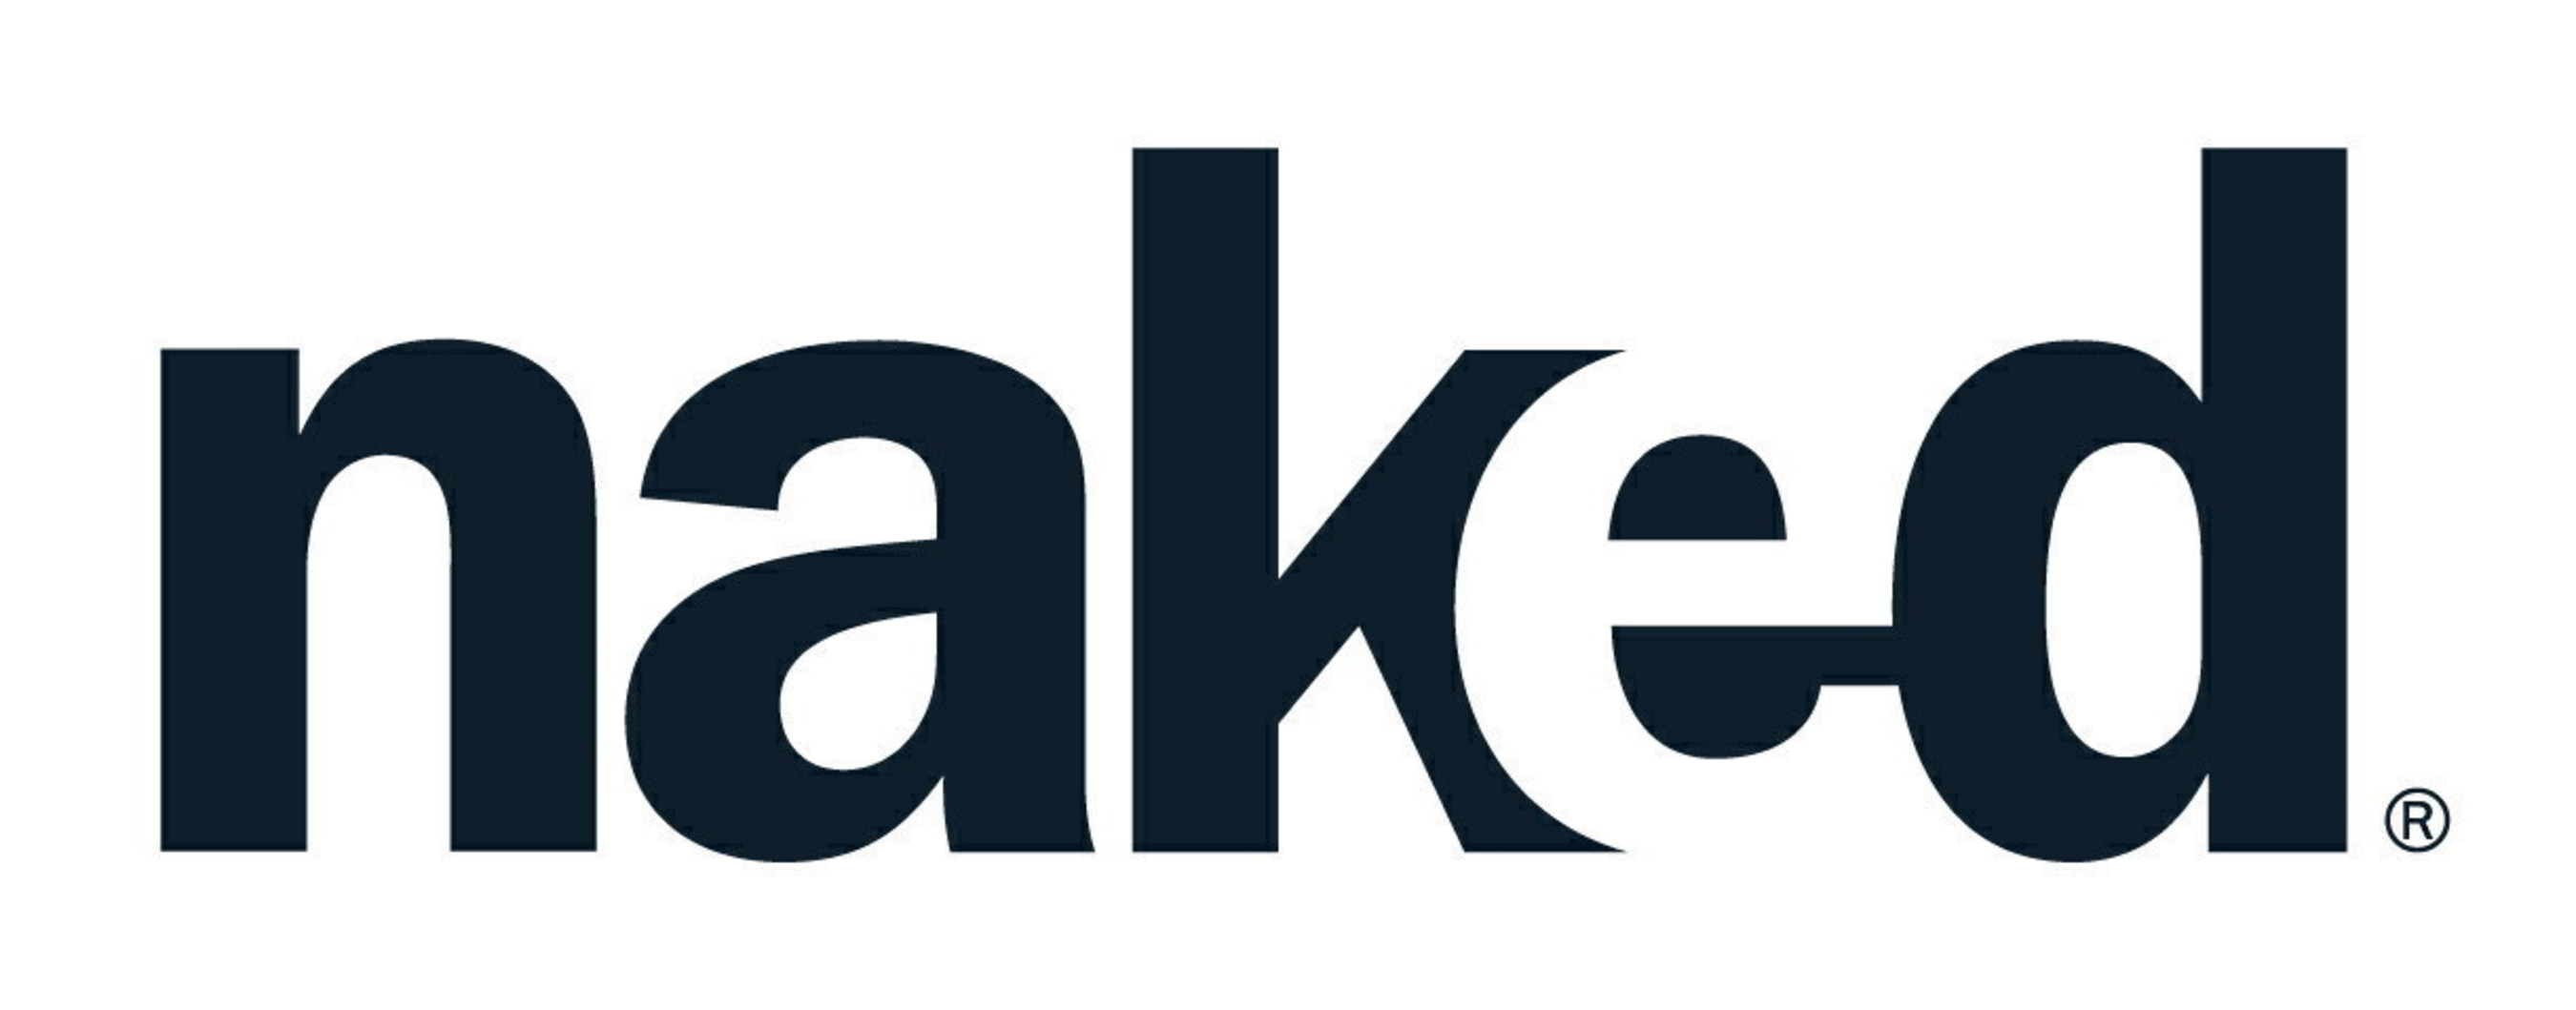 Naked Brand (NAKD) Stock Price History   wallmine